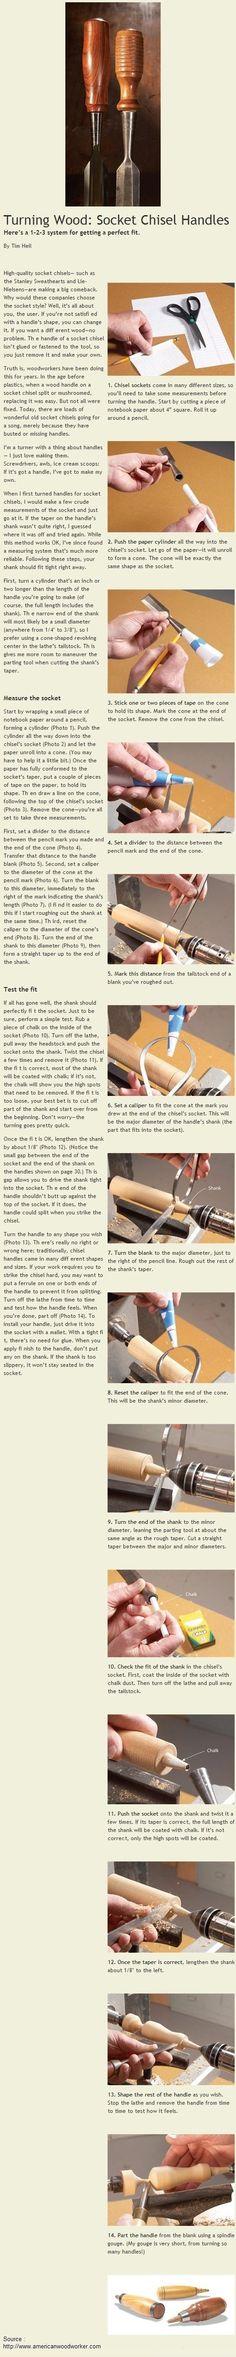 Turning Wood..Socket Chisel Handles   WoodworkerZ.com